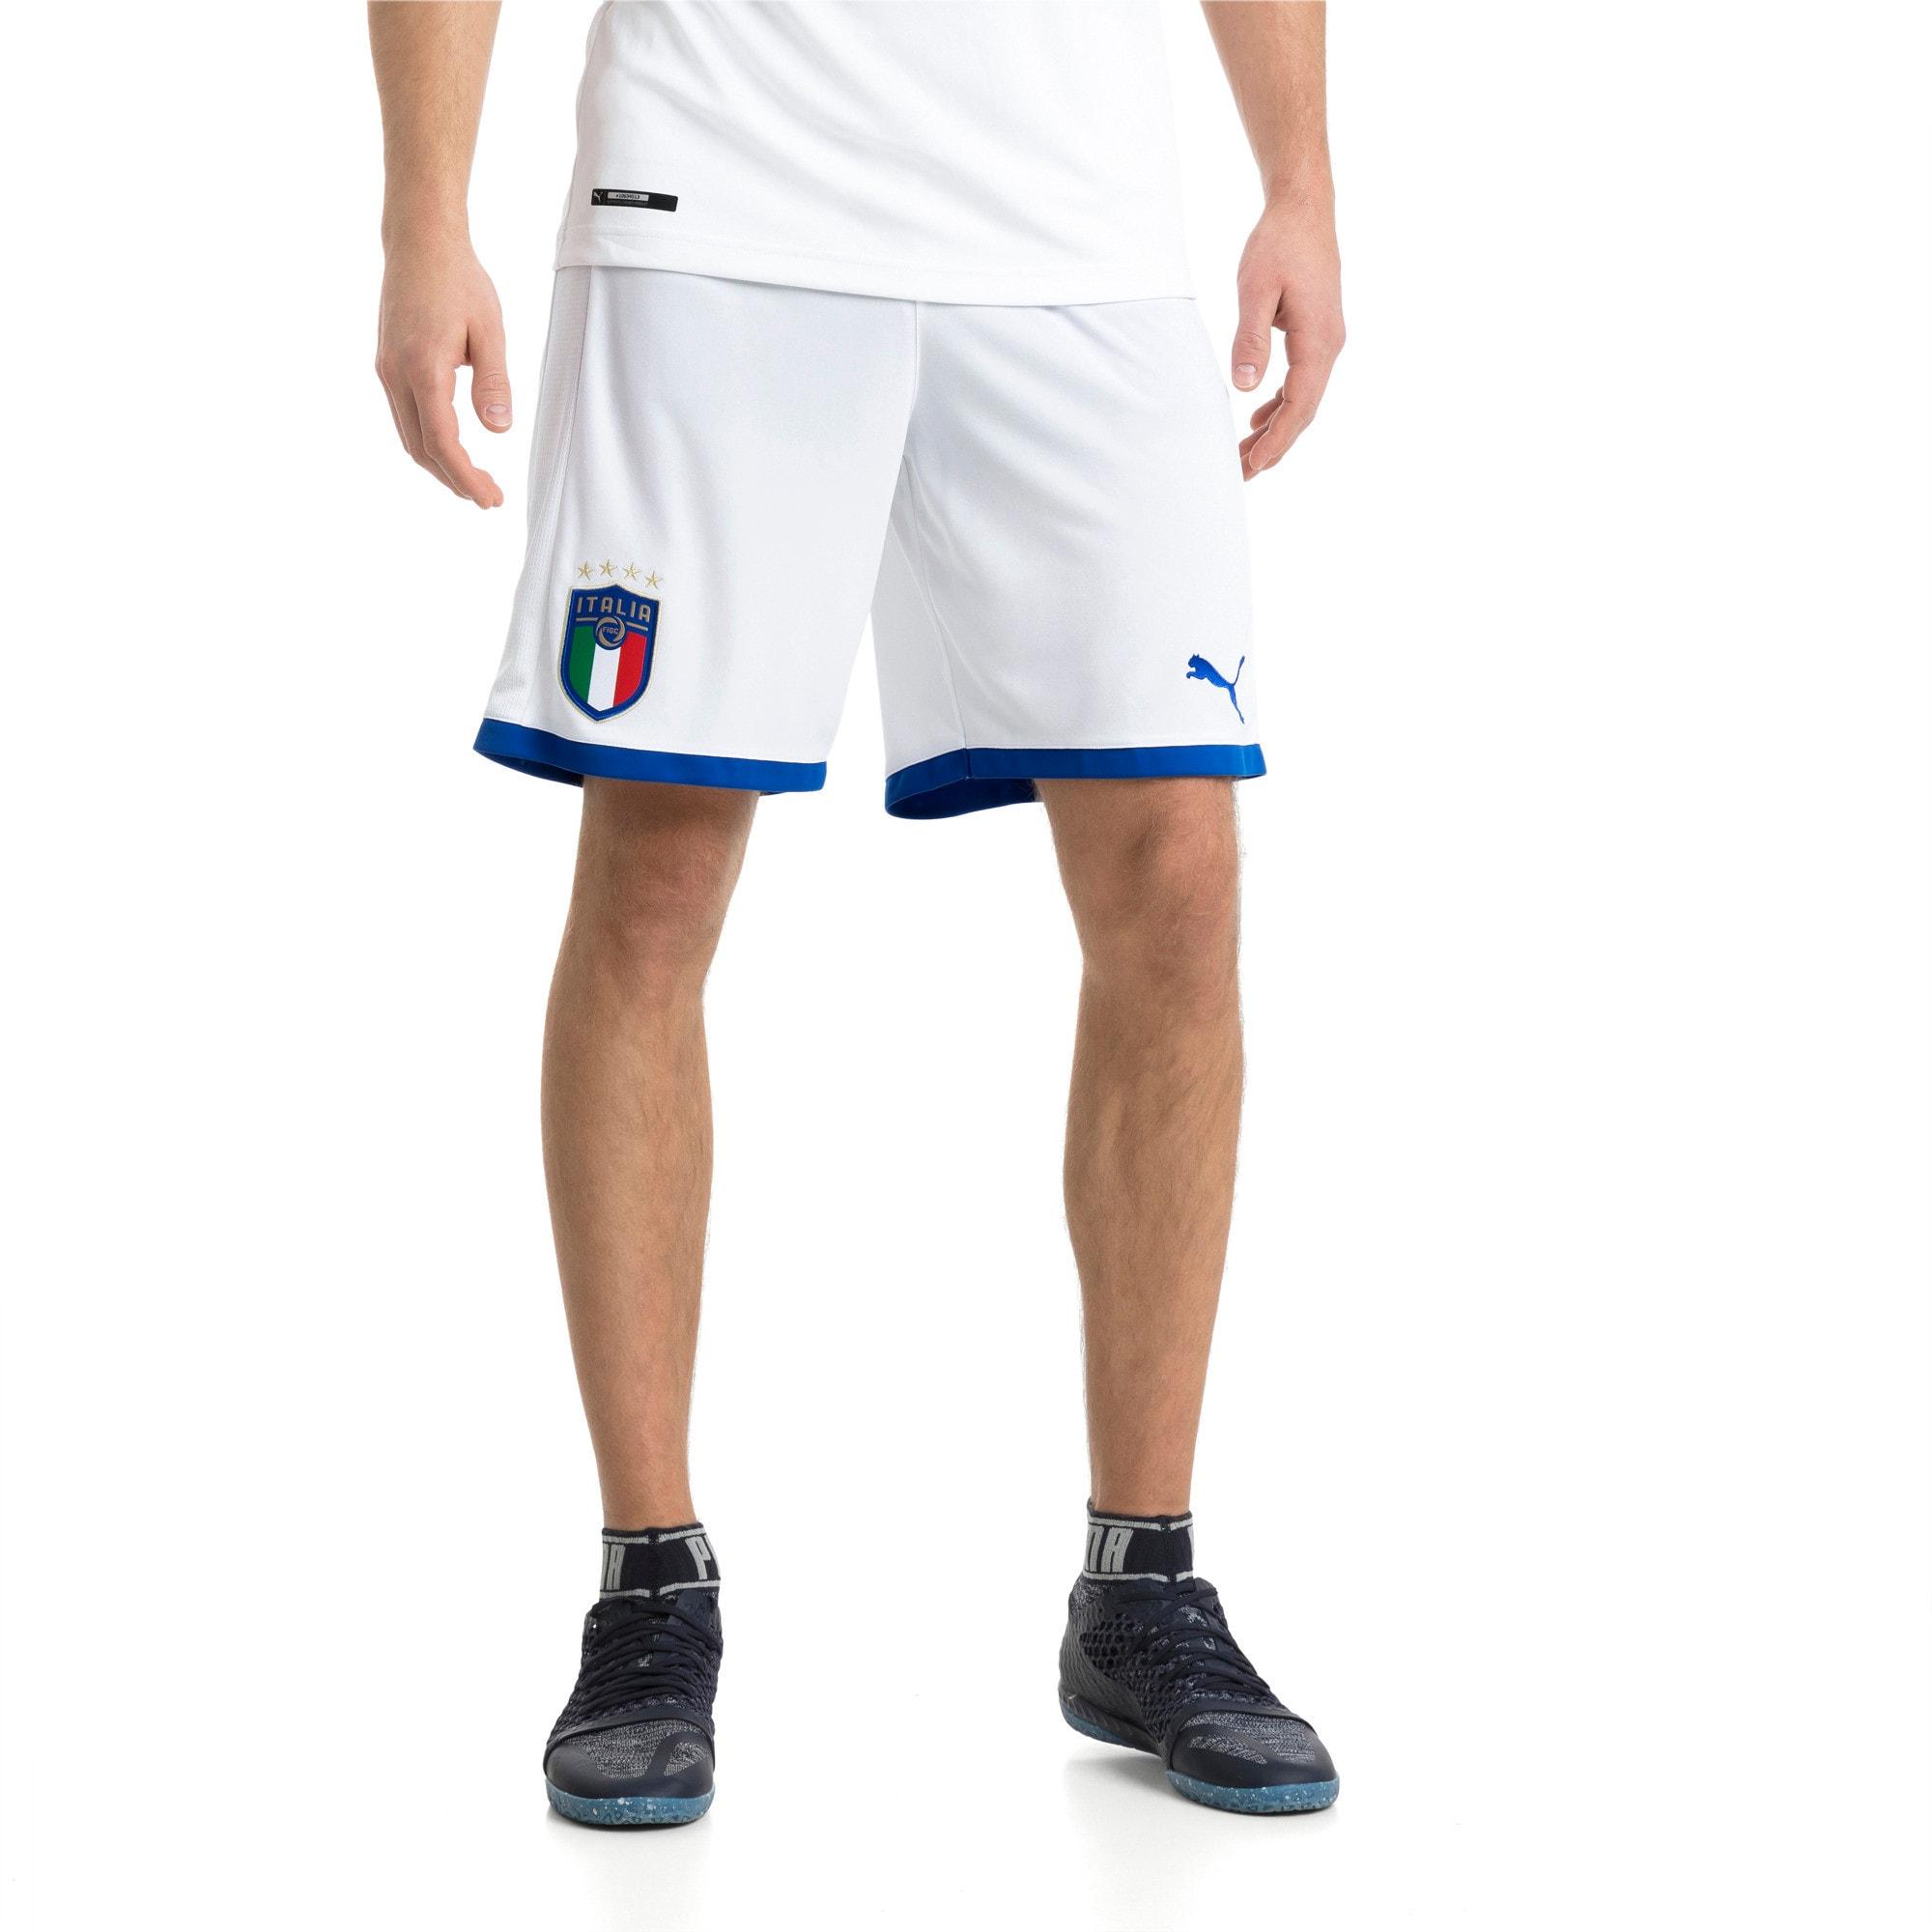 Thumbnail 1 of FIGC ITALIA ショーツ レプリカ, Puma White, medium-JPN